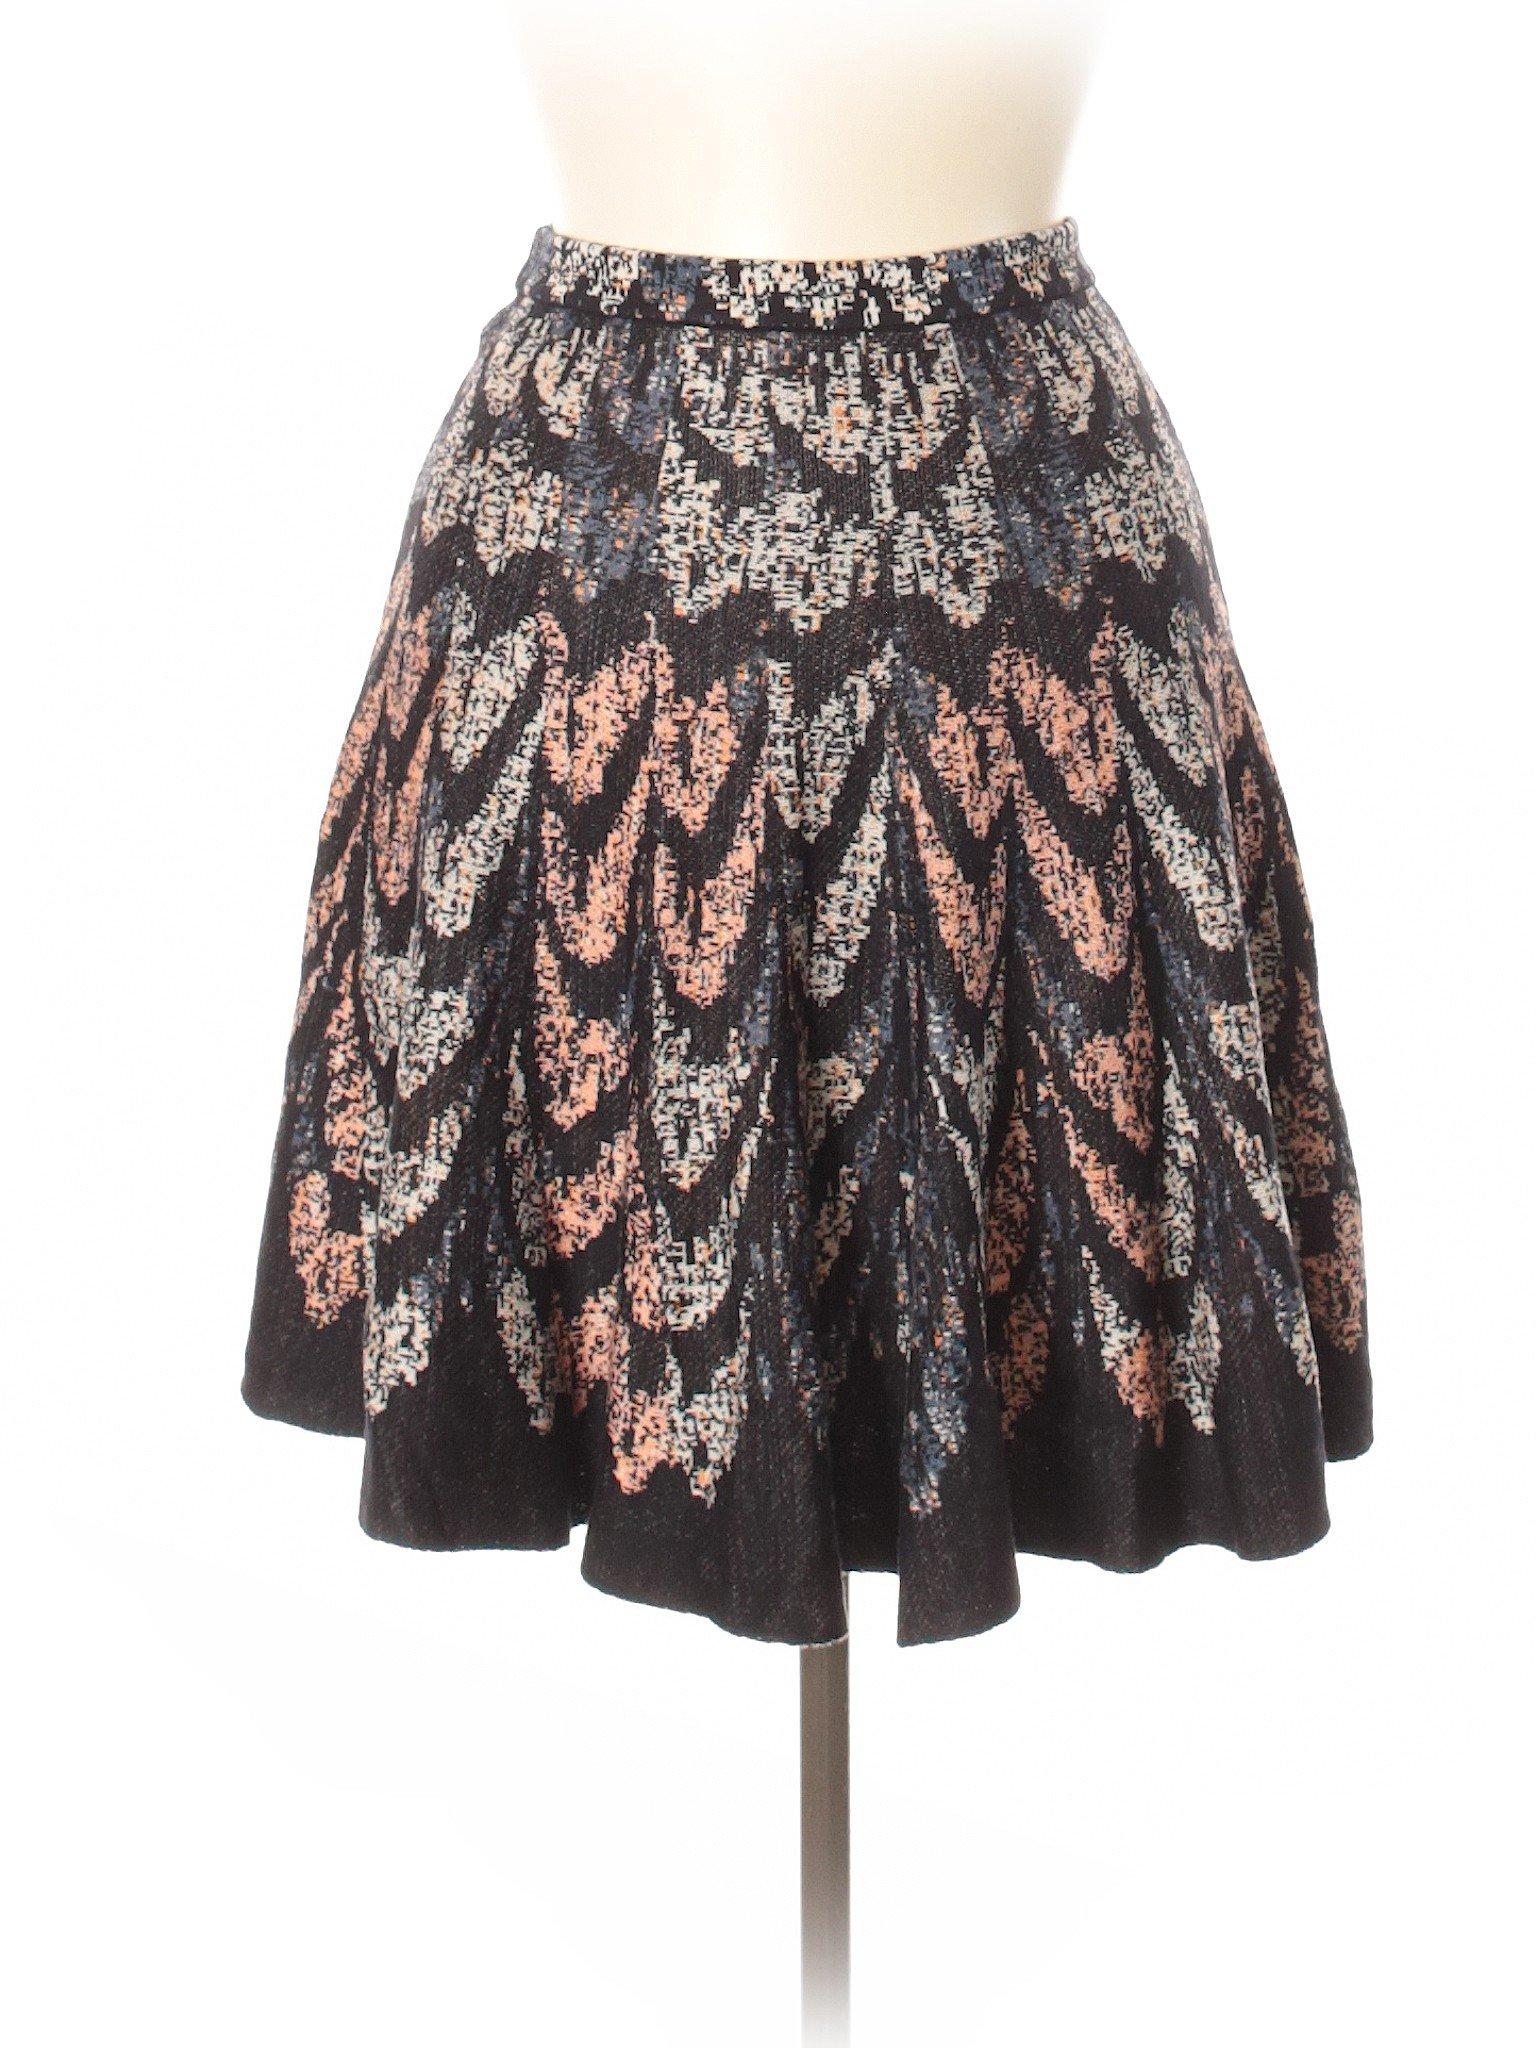 Boutique Skirt Boutique leisure Silk BCBGMAXAZRIA leisure qxdF4qwXa